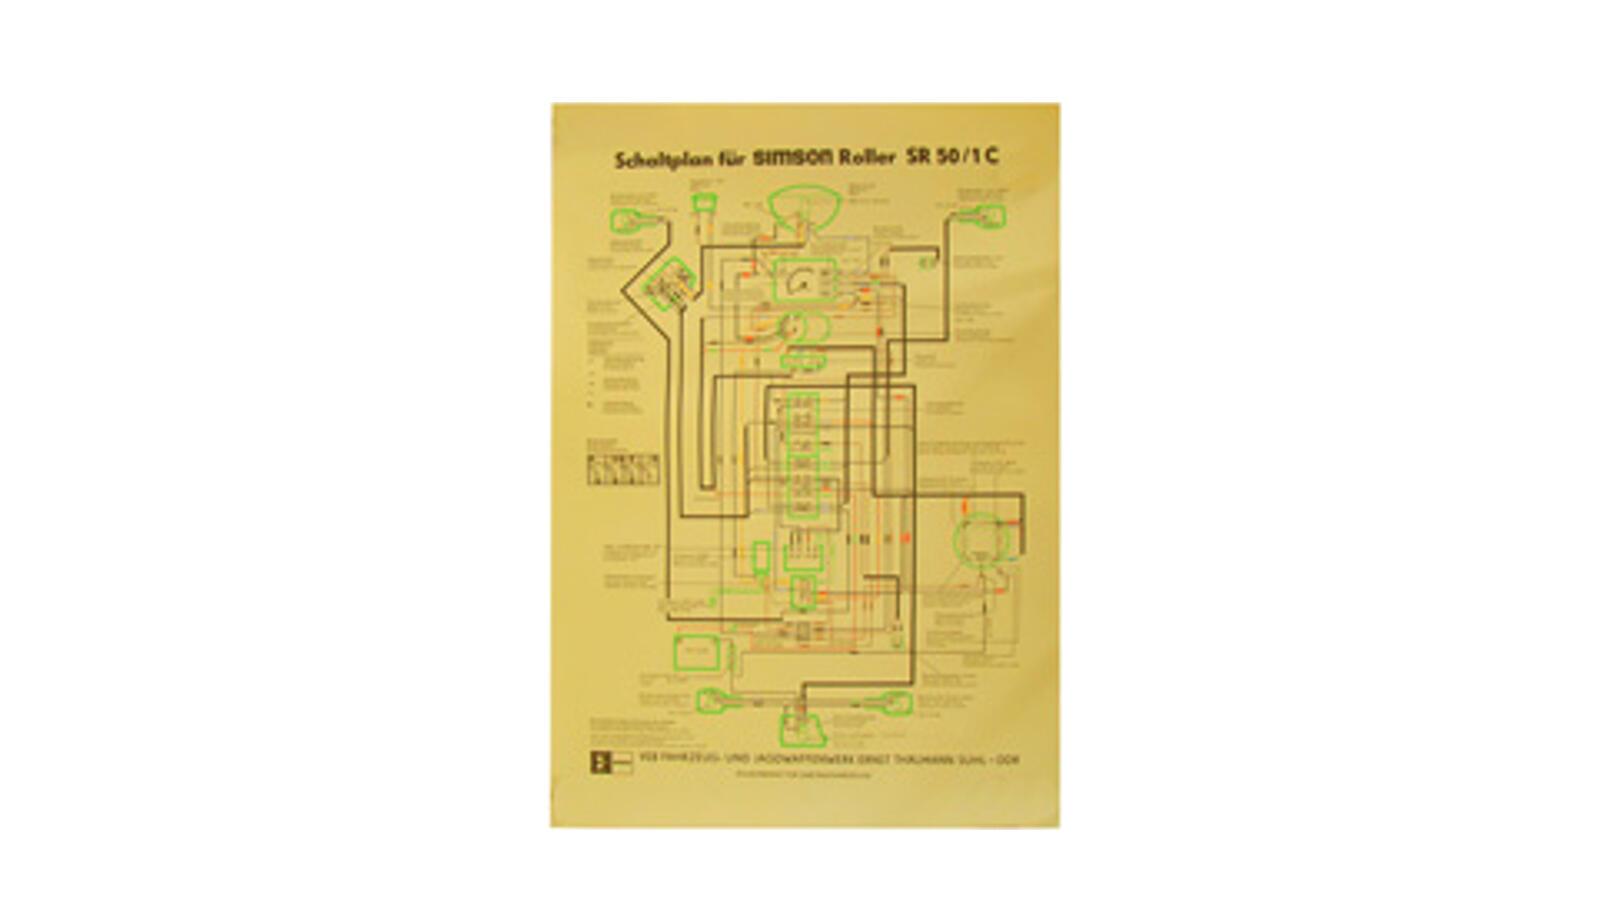 schaltplan farbposter 40x60cm 12v elektronic f r simson. Black Bedroom Furniture Sets. Home Design Ideas